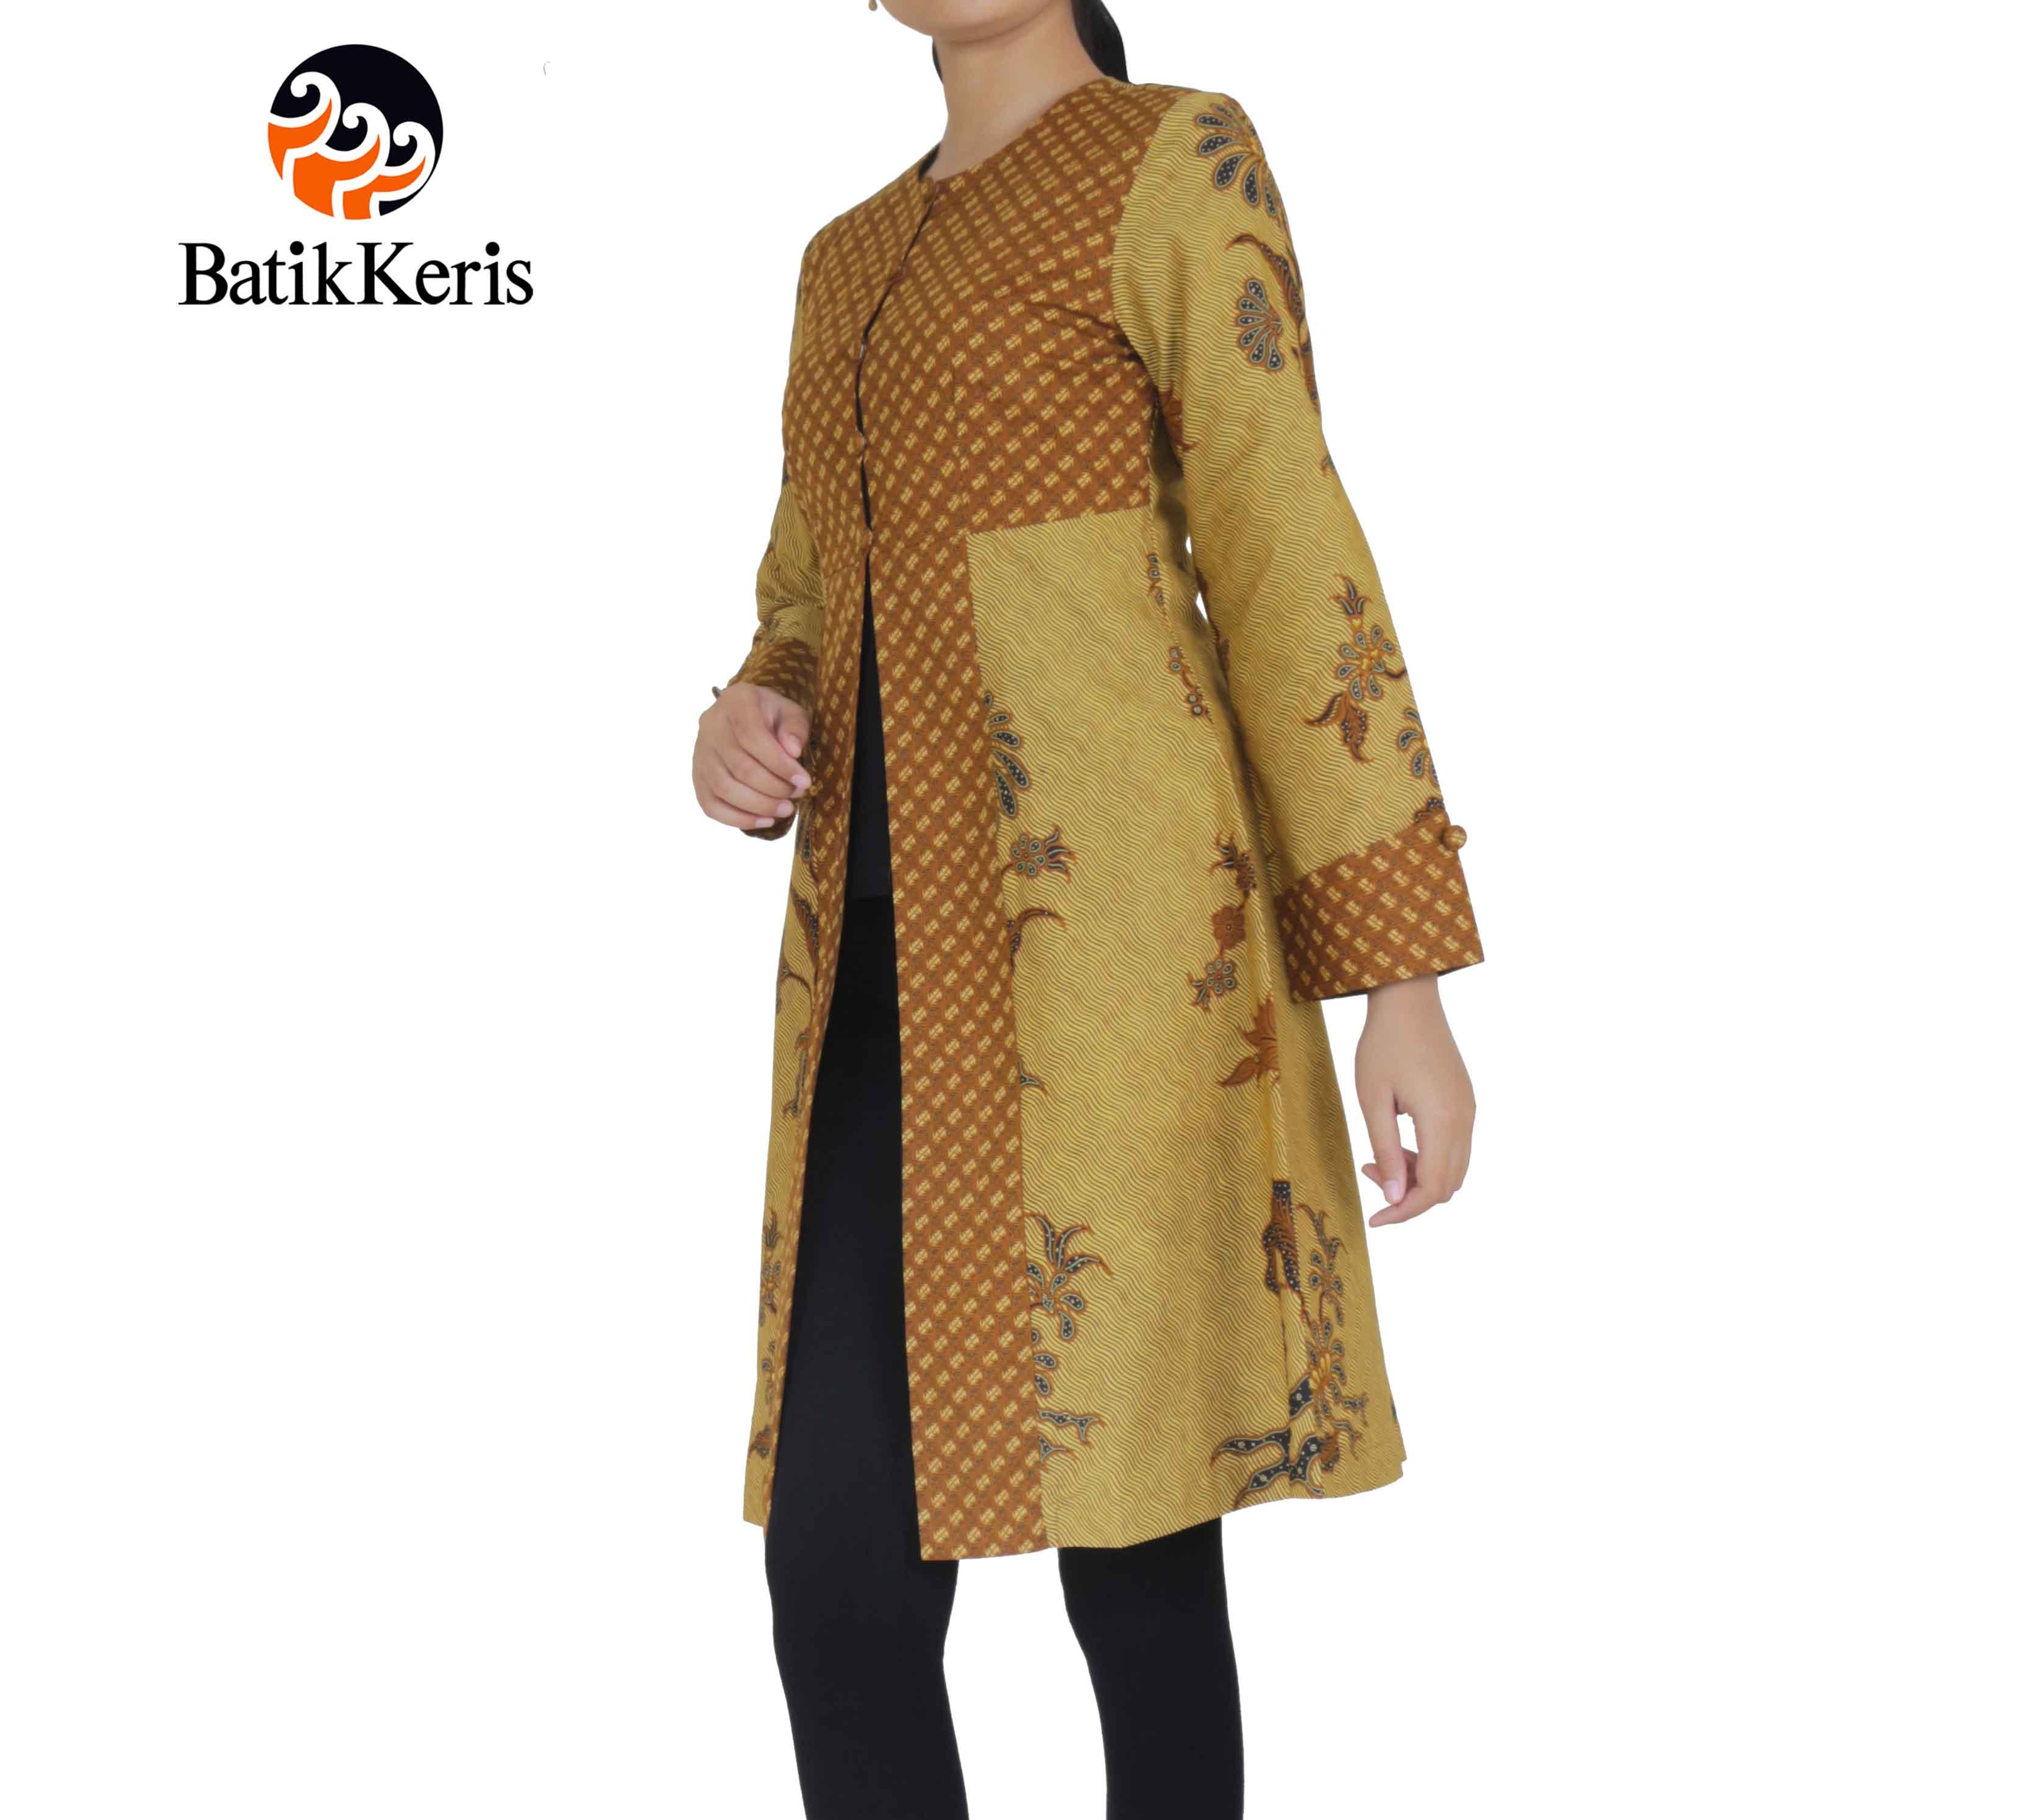 Outer Batik Lengan Panjang Motif Lar Condrowinoto Kombinasi Nitik Rahayu